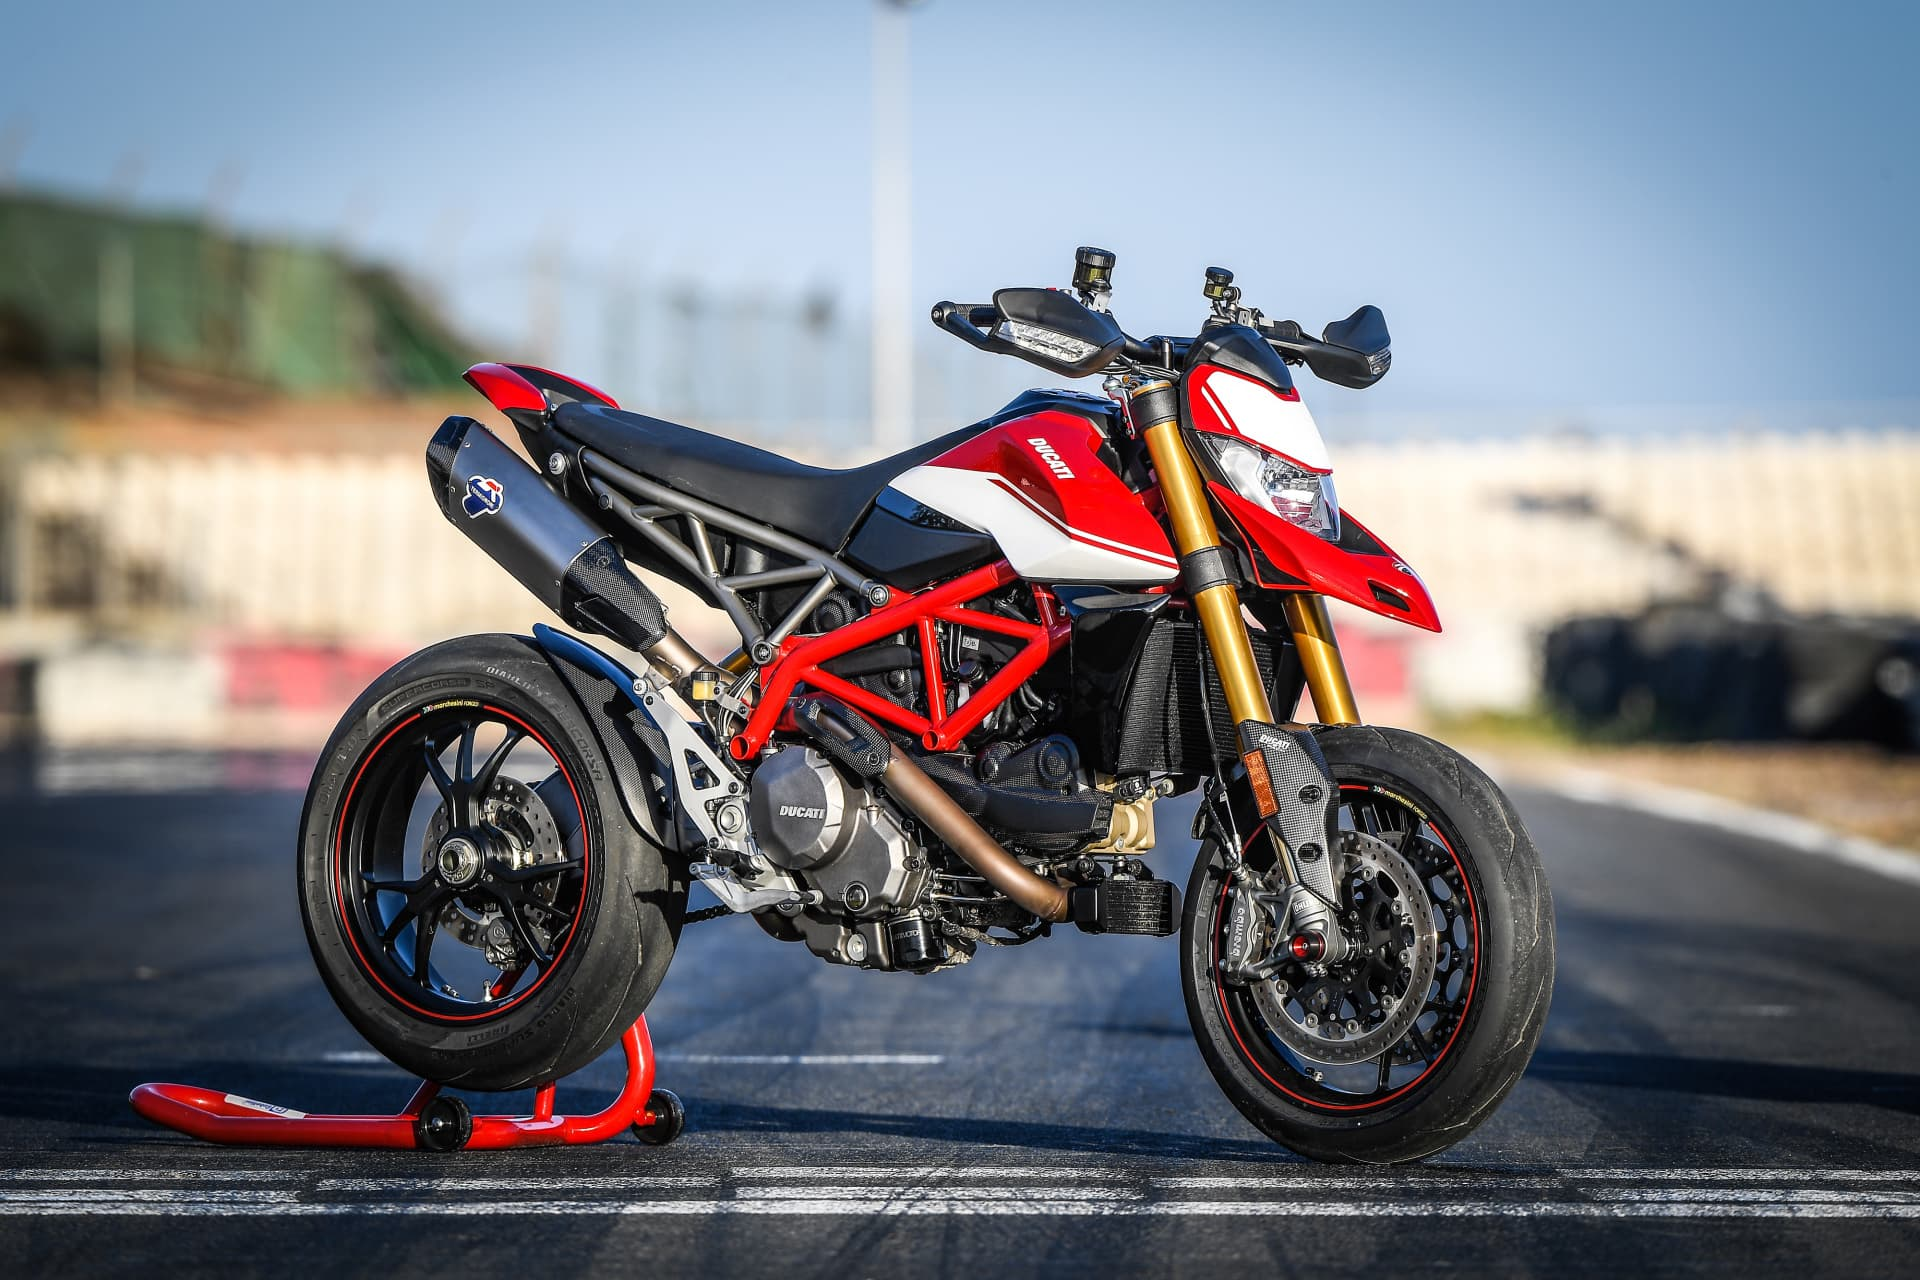 Ducati Hypermotard 950 Sp Static 18 Uc70318 Mid